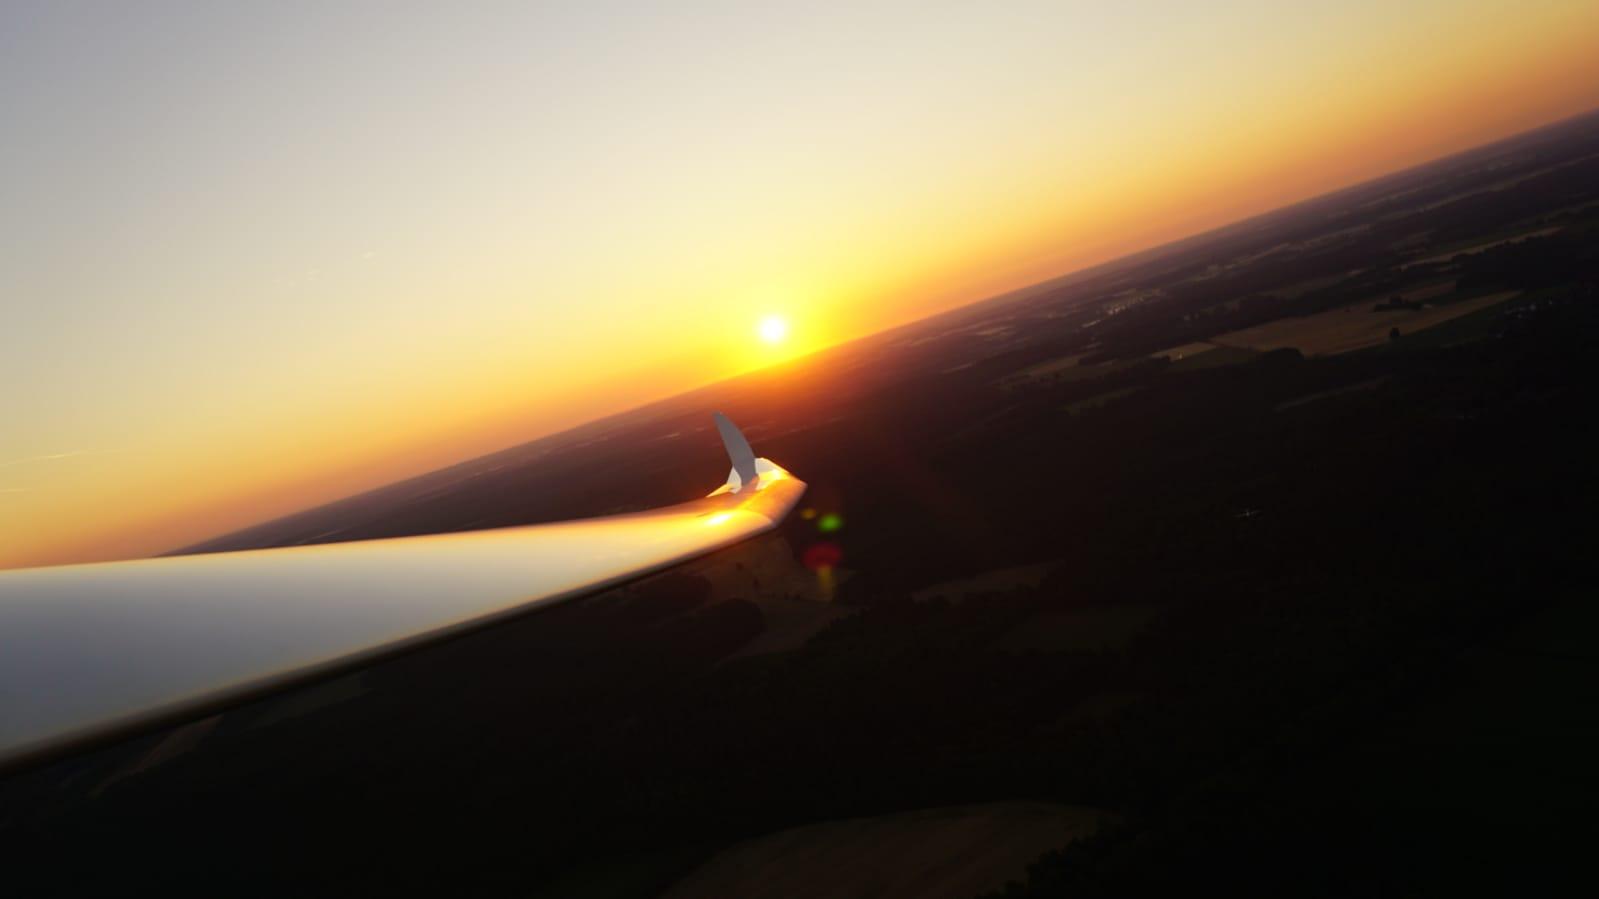 Sonnenaufgang in Scheuen